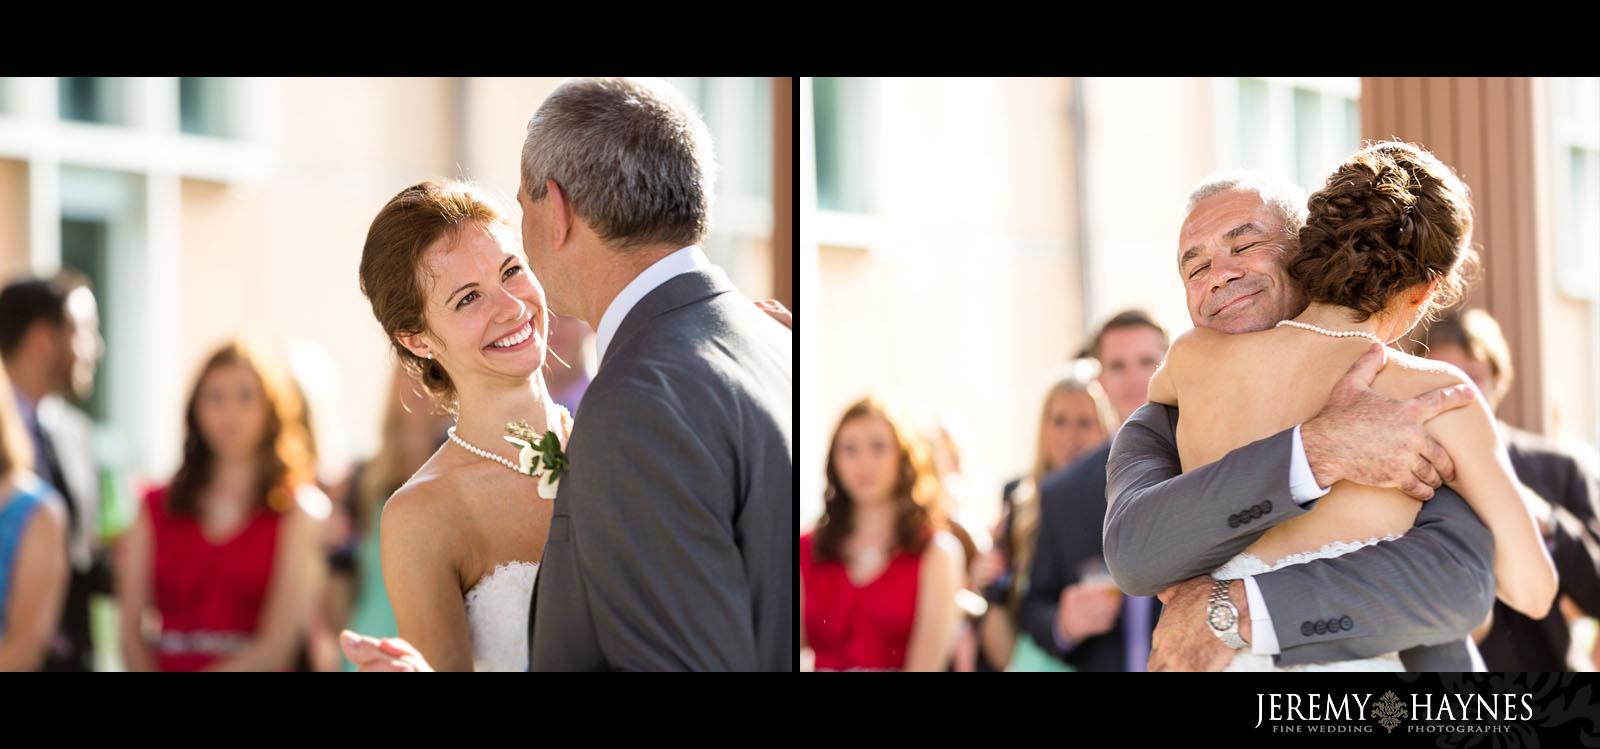 41 Indianapolis Art Center Indianapolis, IN Father Daughter Dance Wedding Photos.jpg